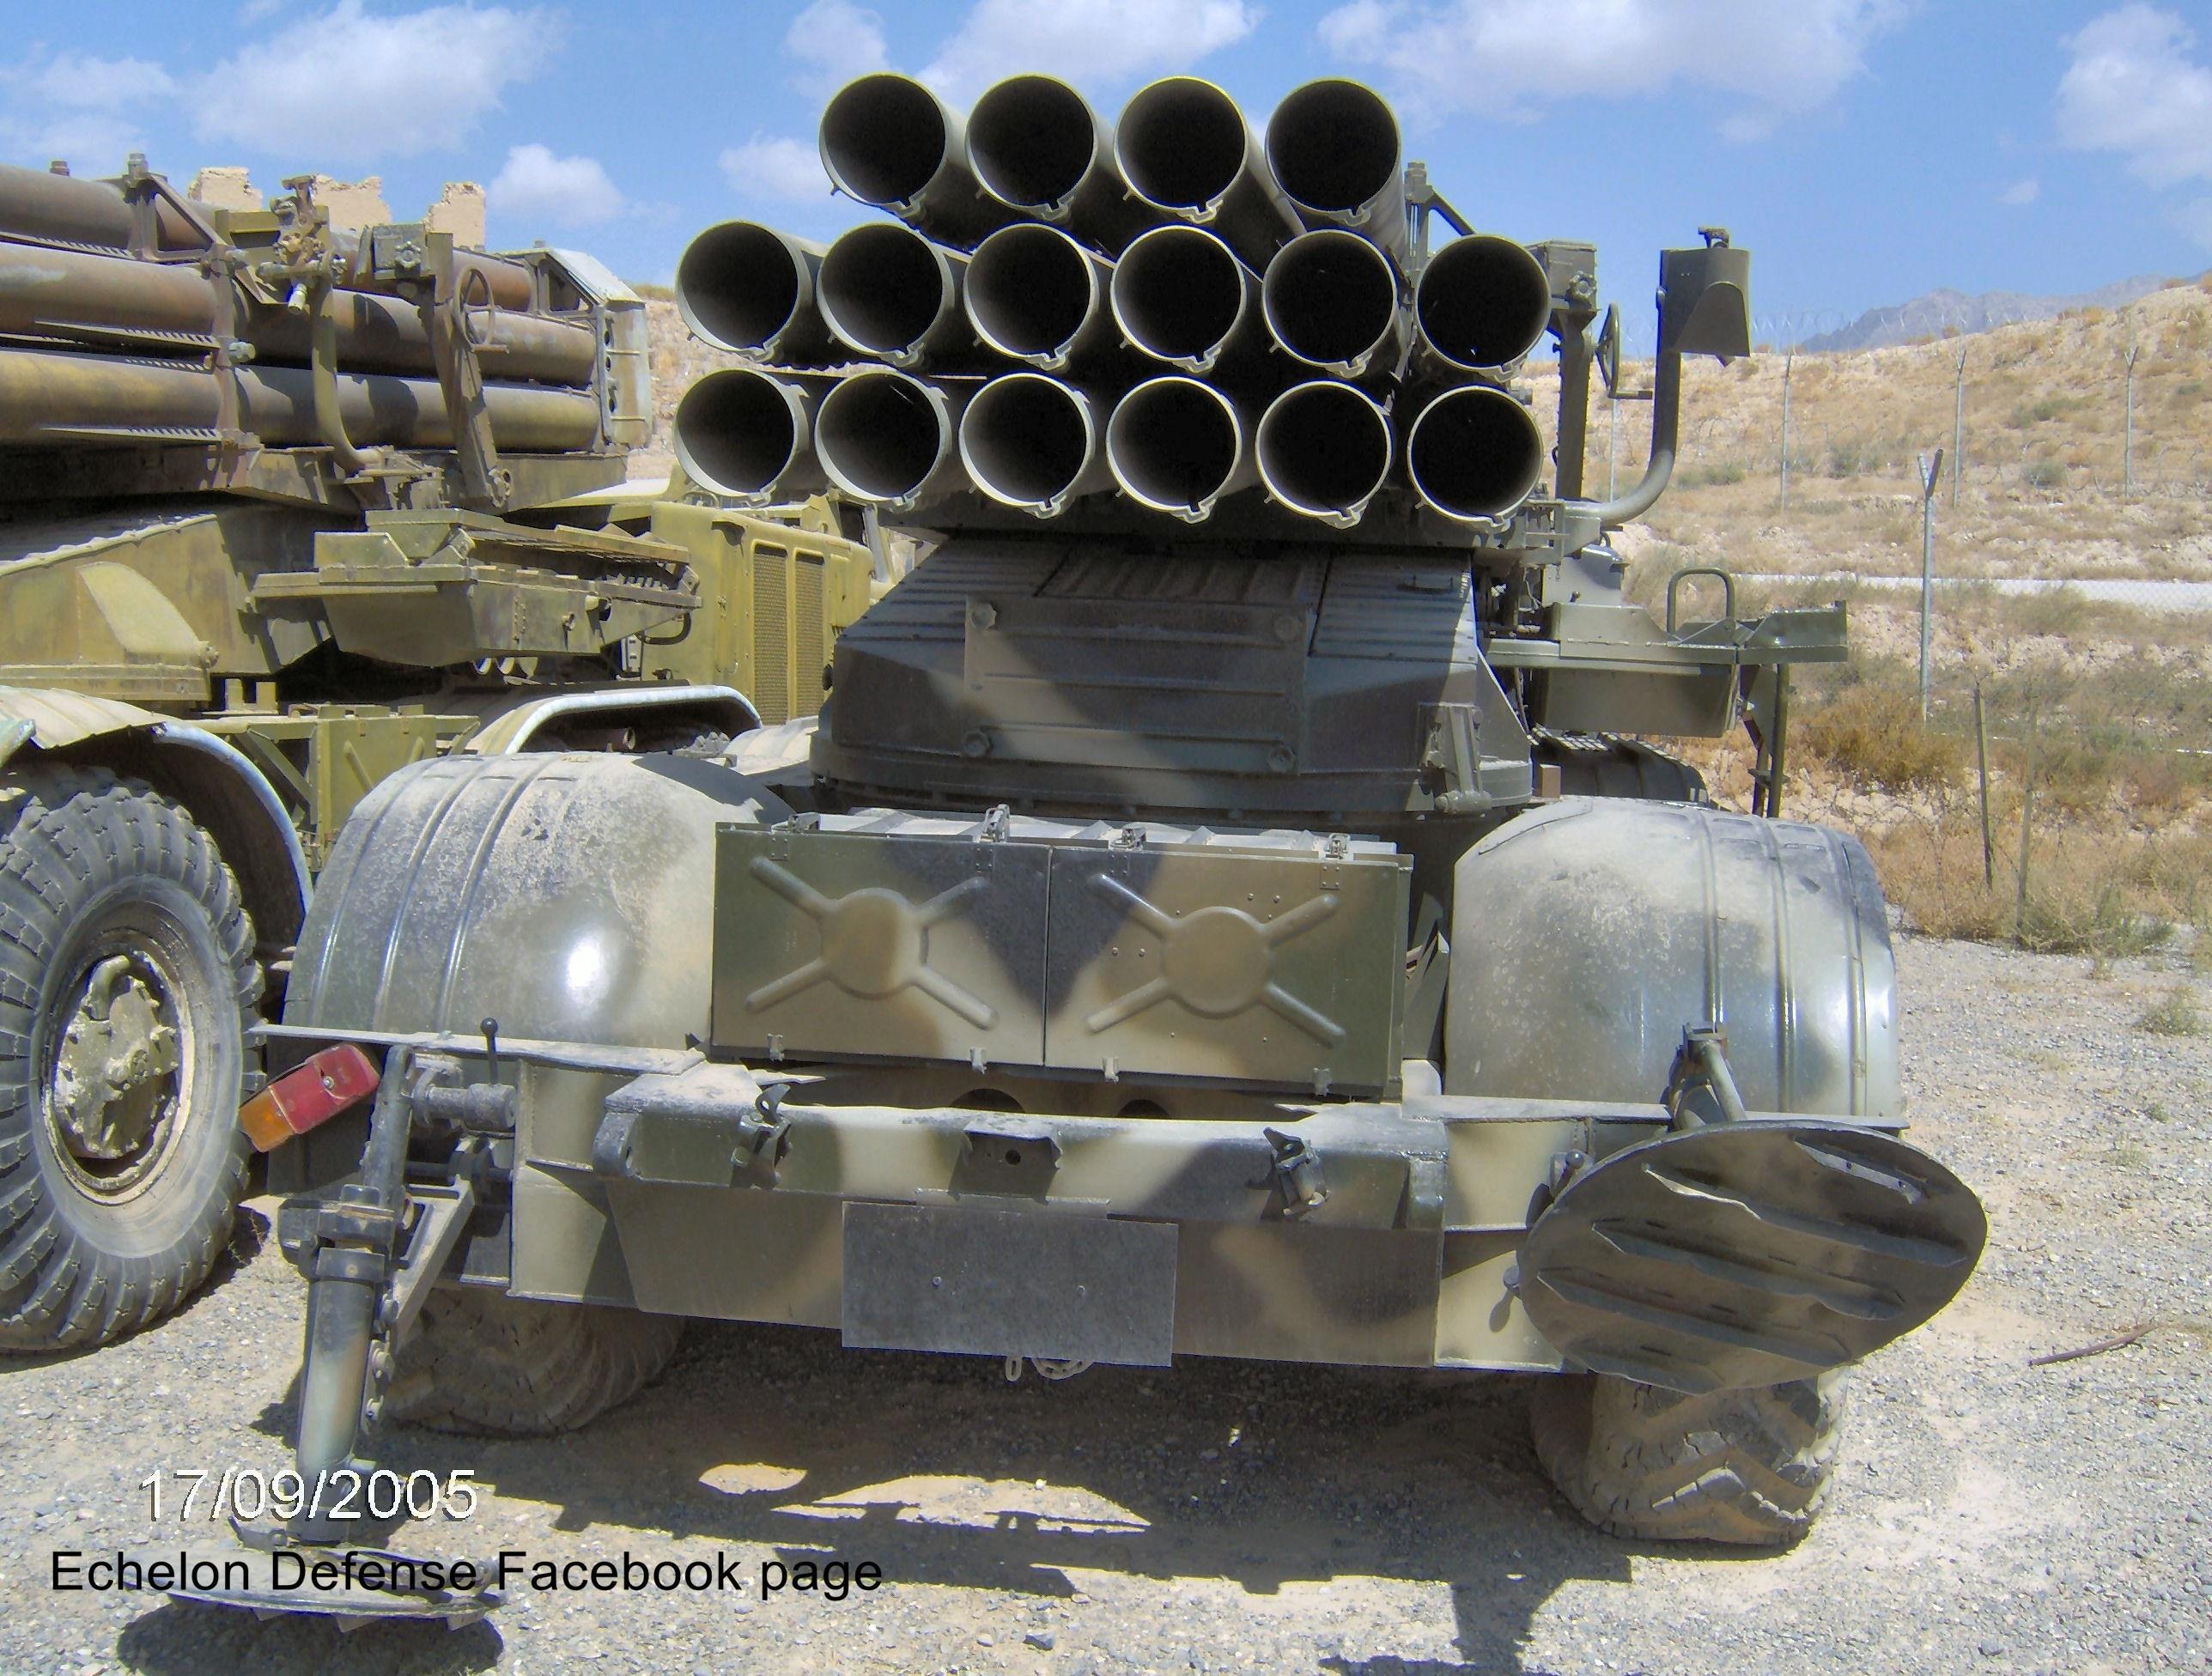 Russian MRLS: Grad, Uragan, Smerch, Tornado-G/S - Page 6 WpJitU